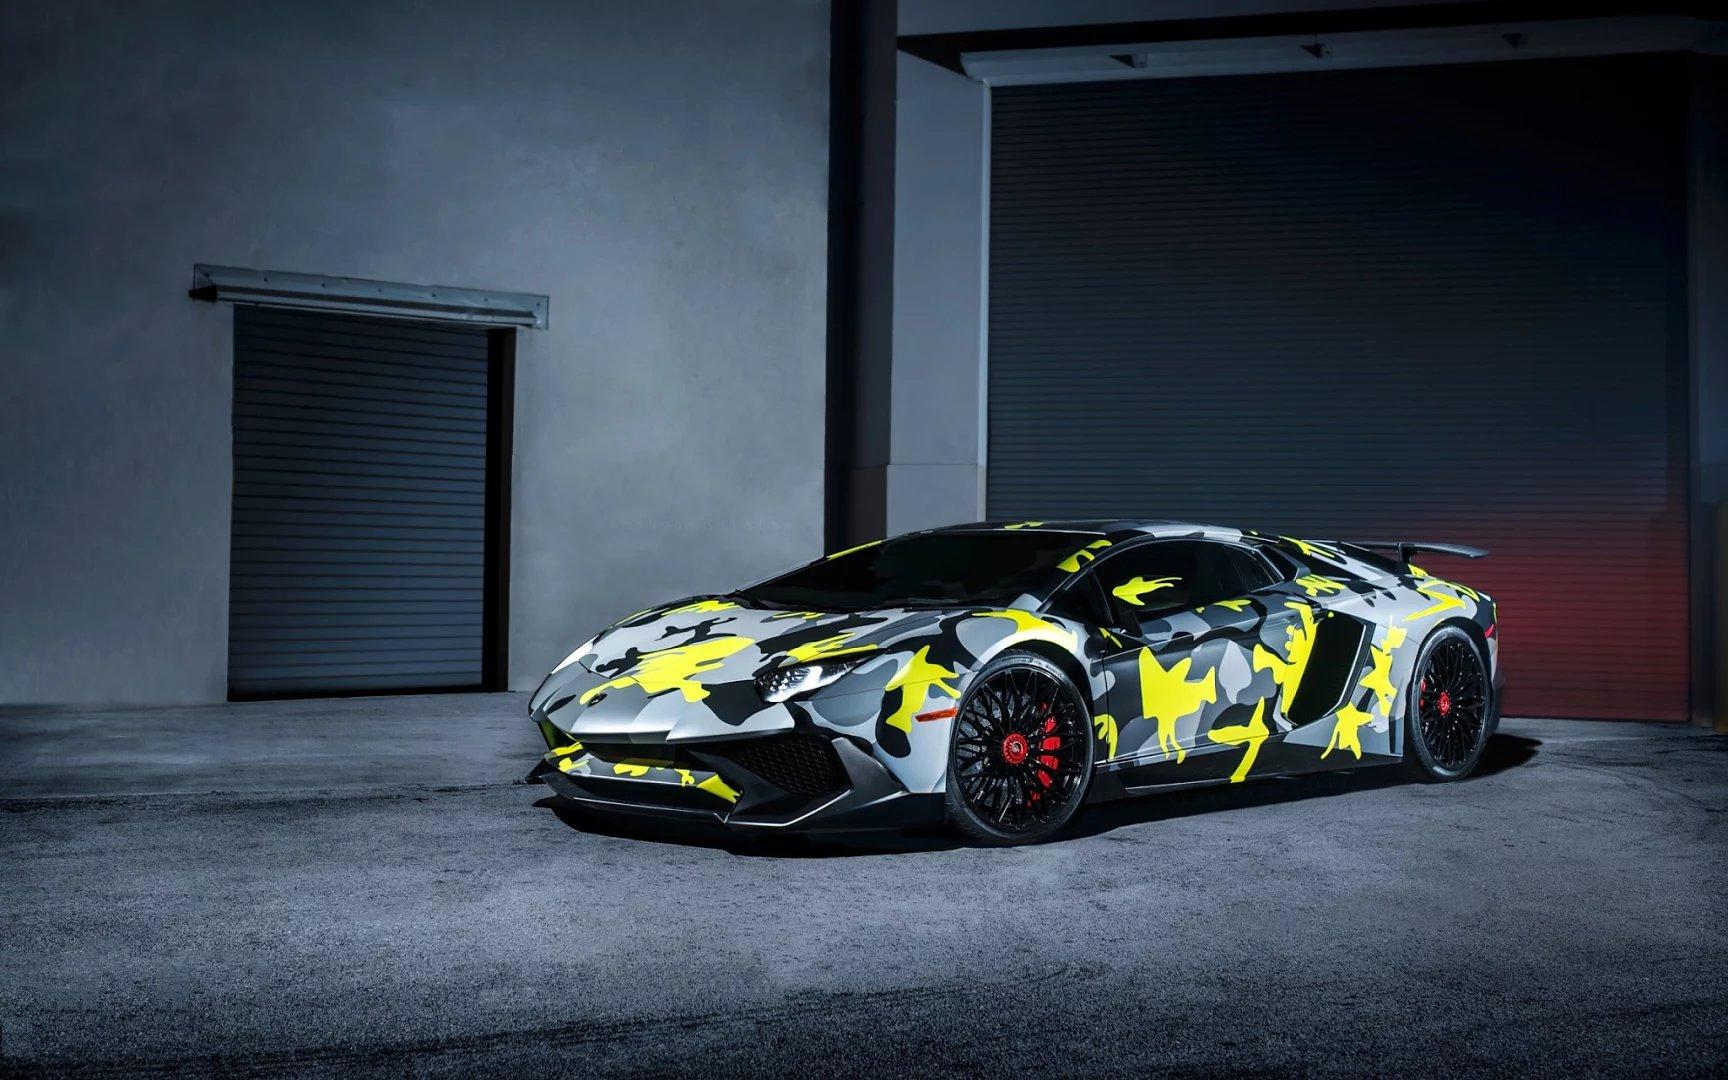 Lamborghini-Aventador-LP-SV-lamborghini-aventador-supercar-wallpaper-wp5208617